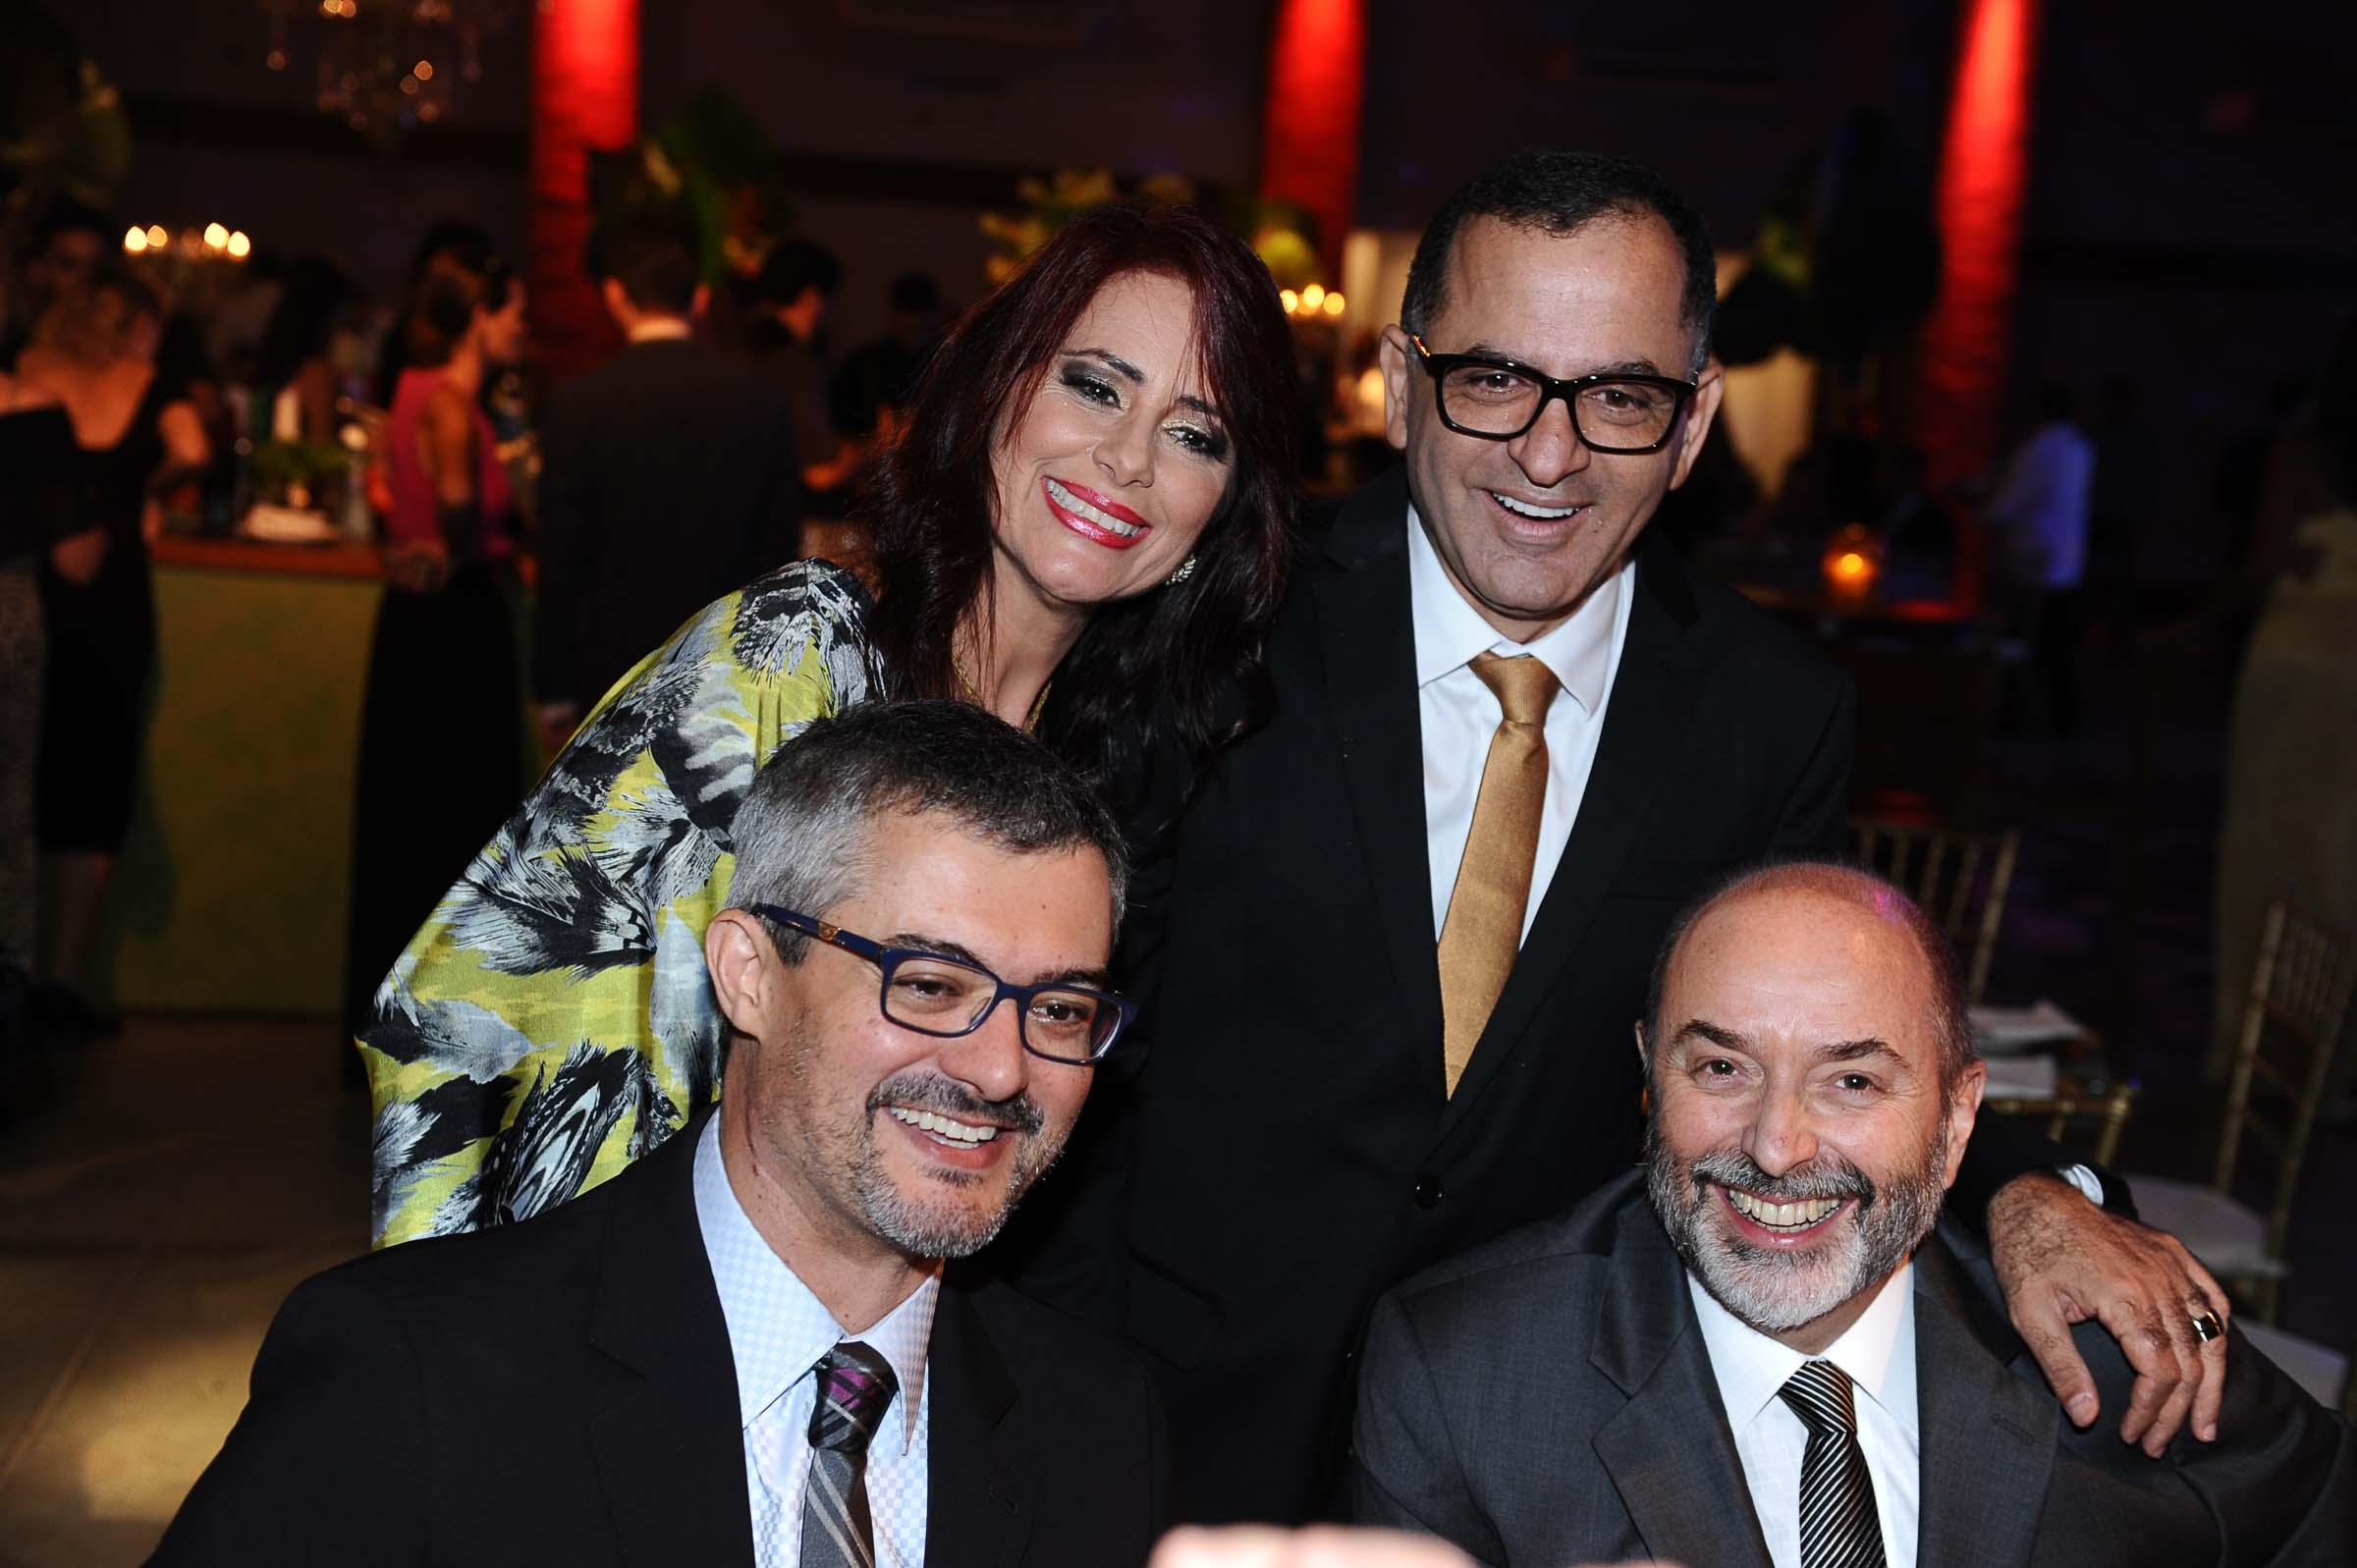 Rosi Mery Guidi, Jefferson de Almeida, Marcio Bezerra e Raul Borges Filho